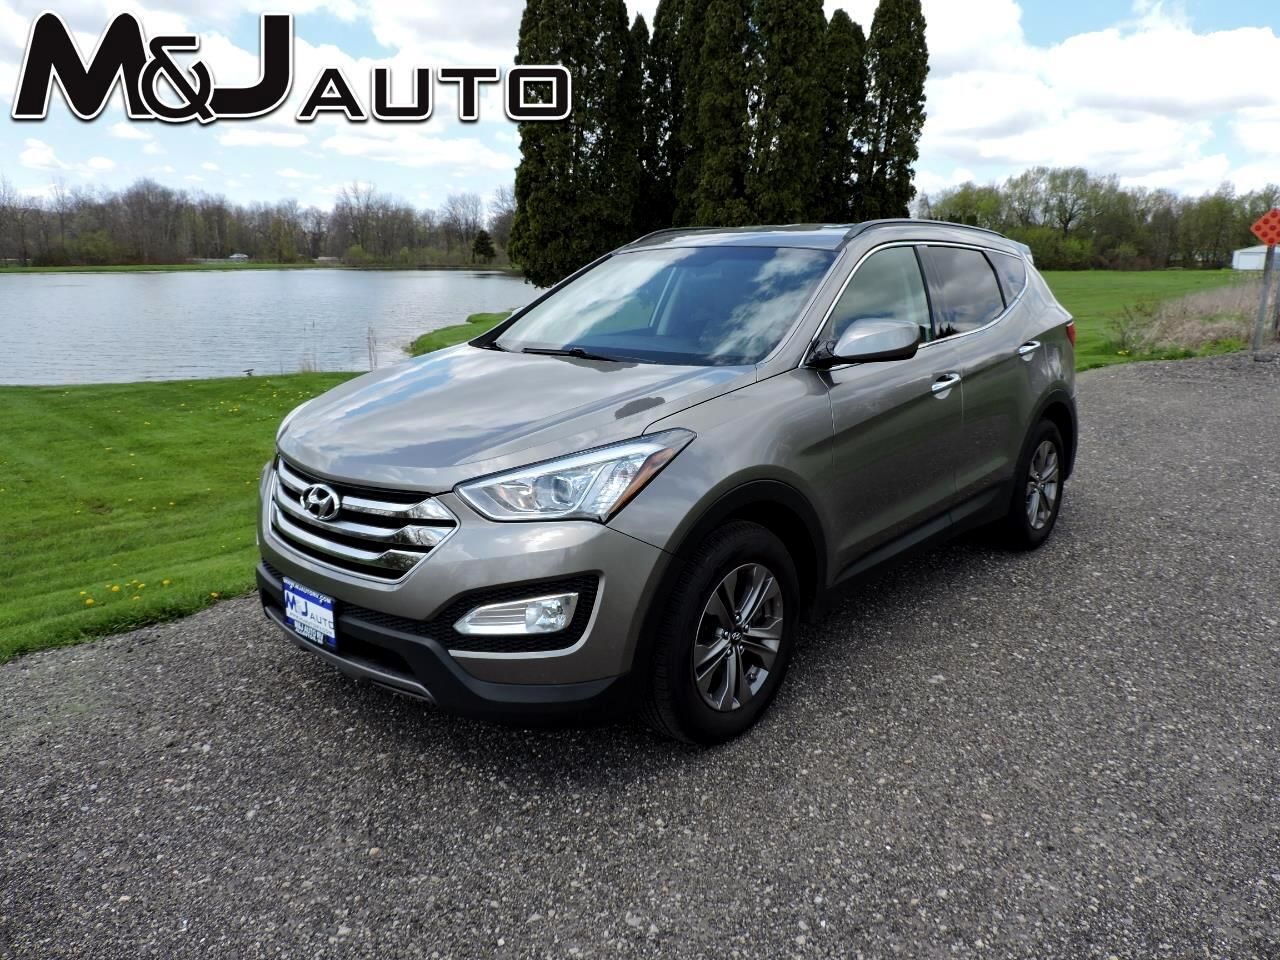 2015 Hyundai Santa Fe FWD 4dr 2.4